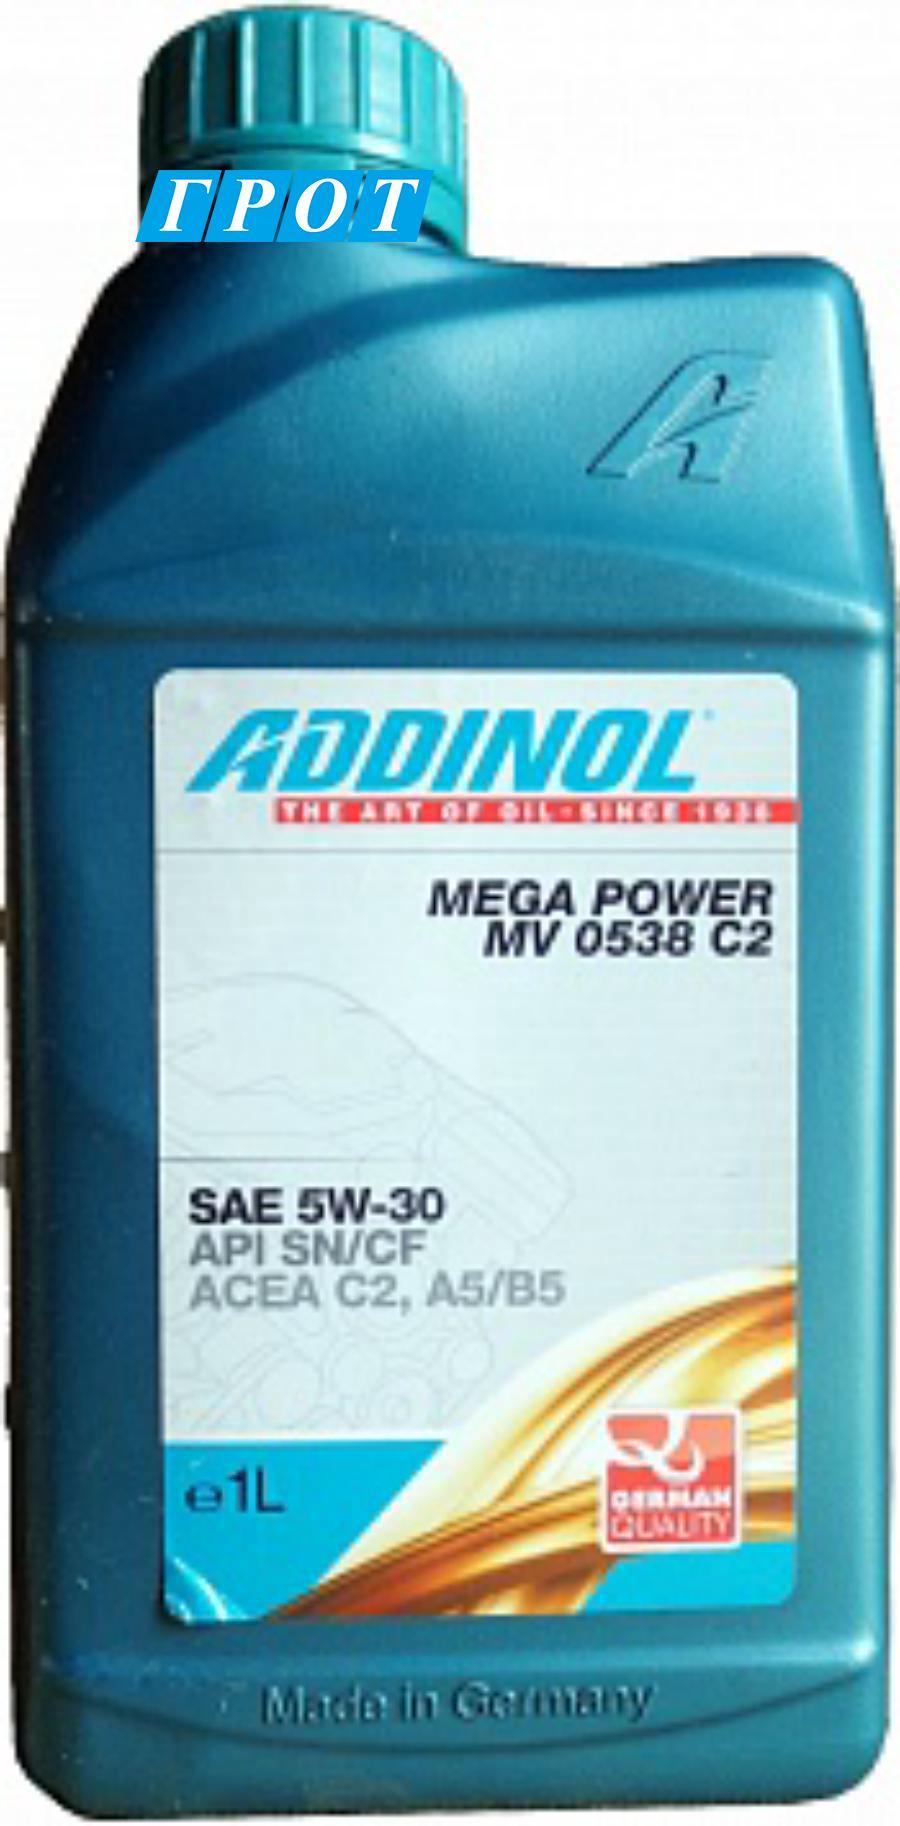 Масло моторное синтетическое Mega Power MV 0538 C2 5W-30, 1л